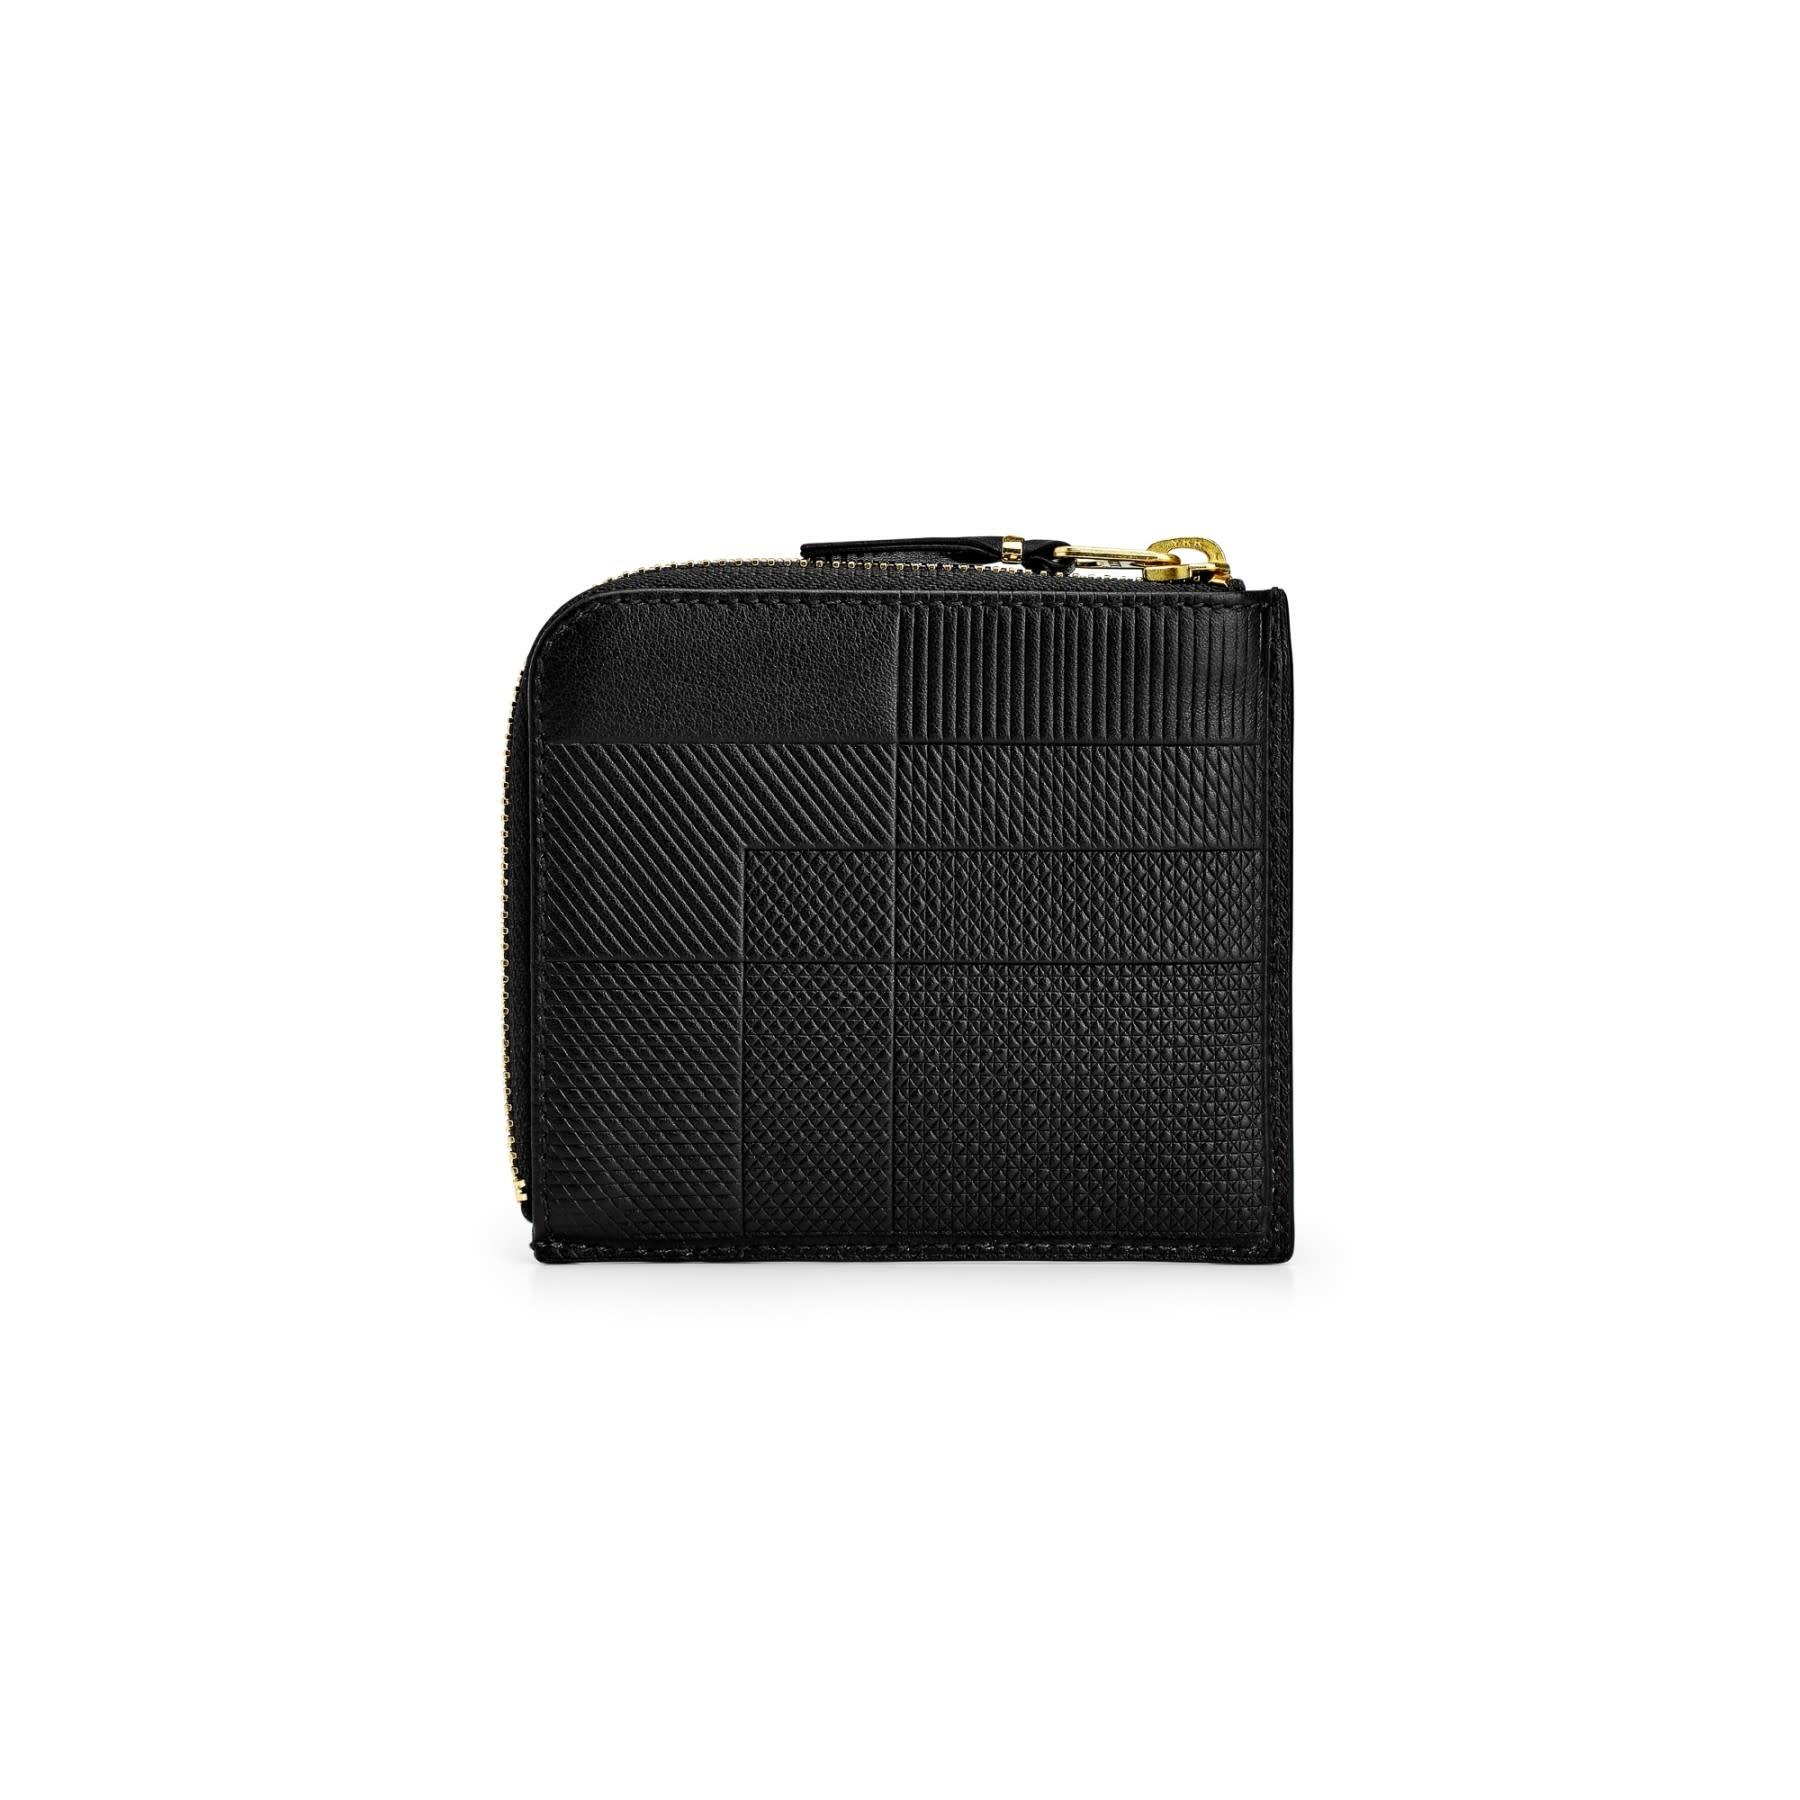 COMME des GARÇONS WALLET Intersection Lines 1/2 Zip Wallet Black SA3100LS